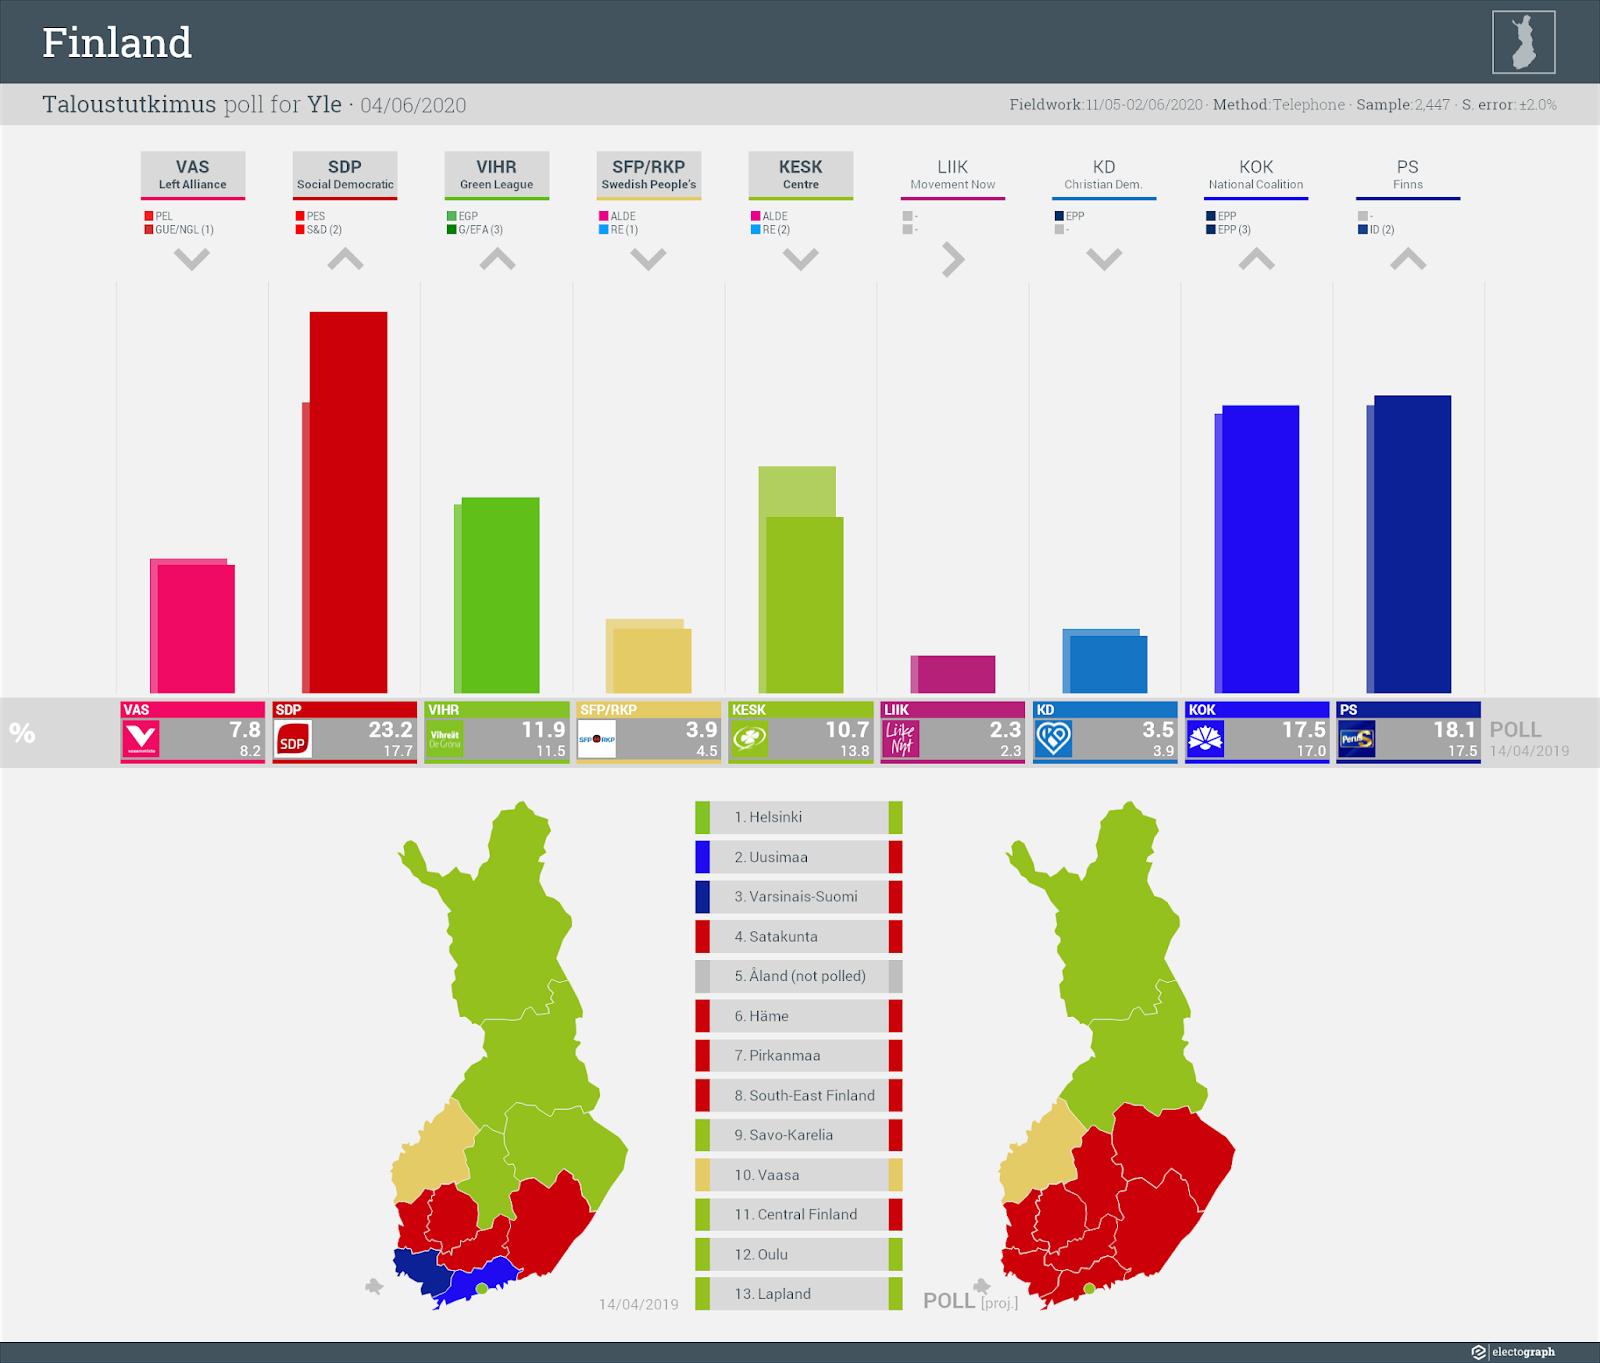 FINLAND: Taloustutkimus poll chart for Yle, 6 June 2020